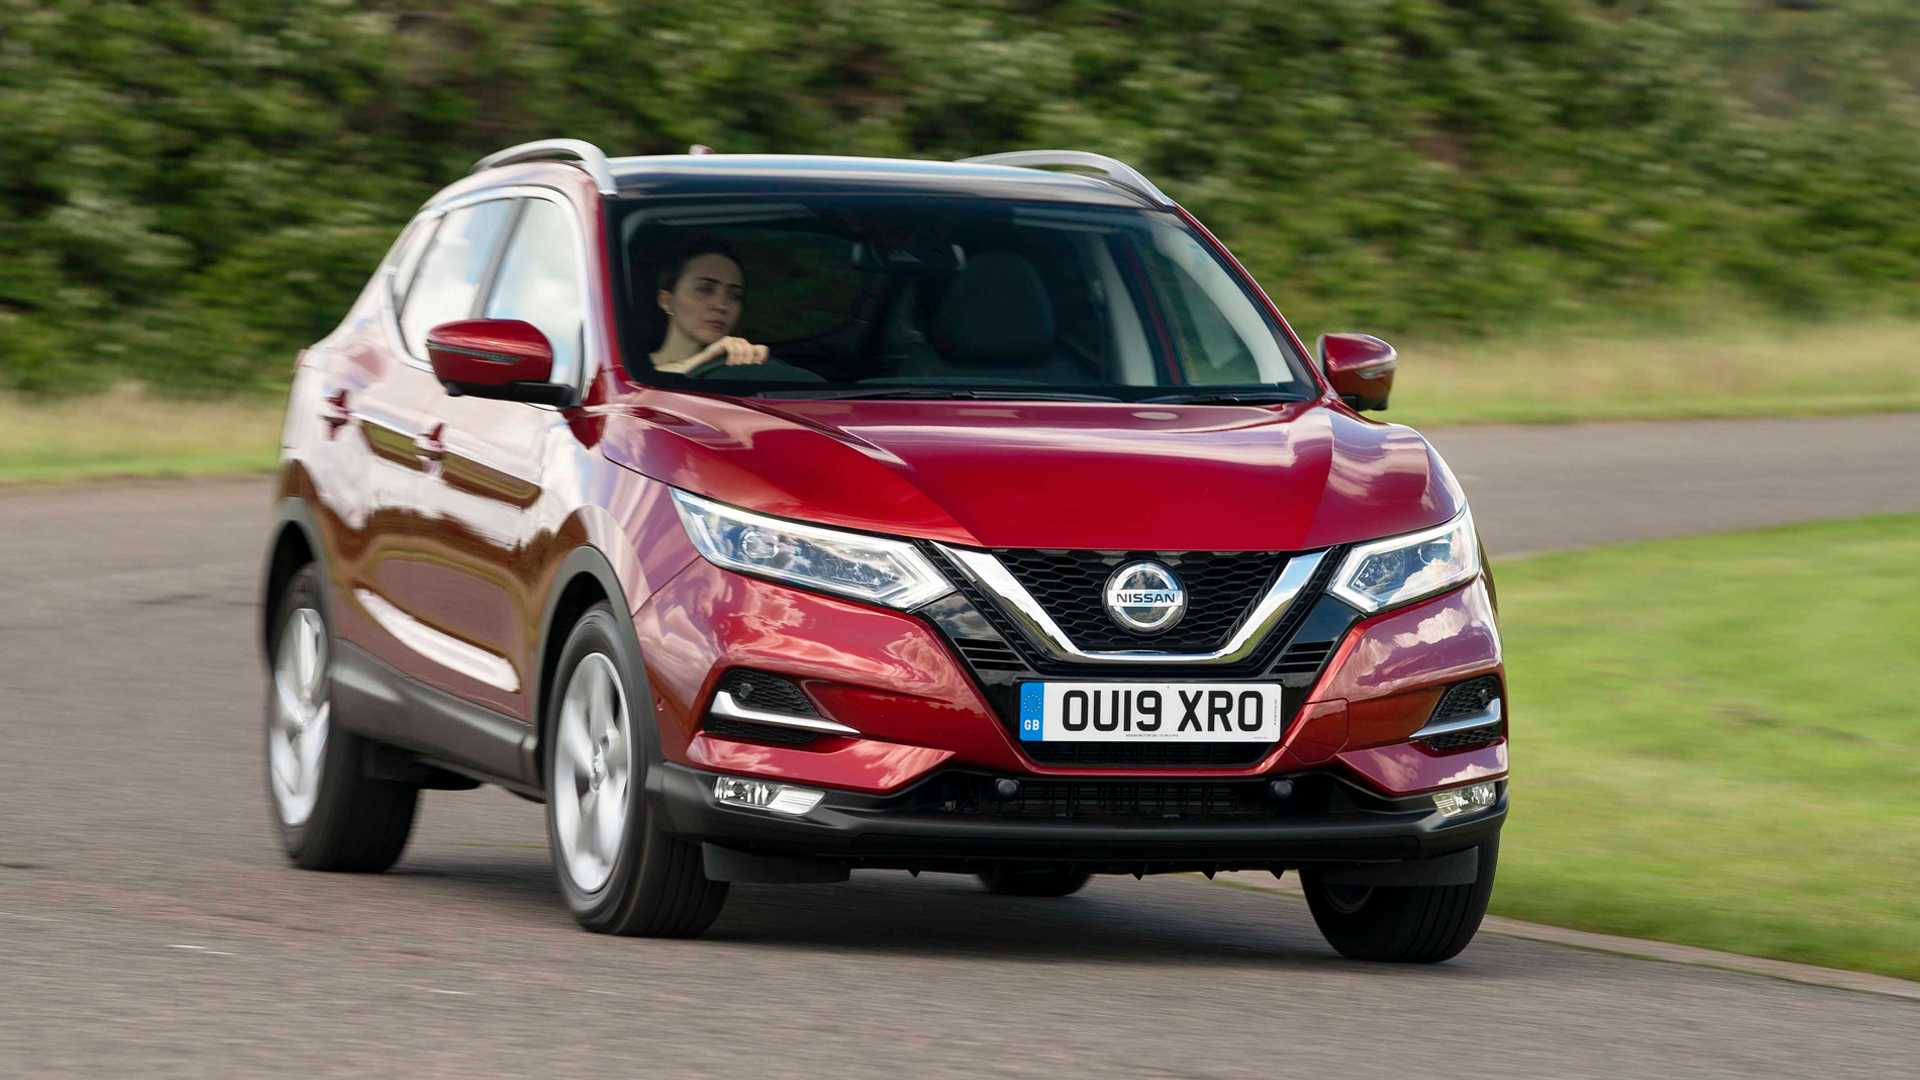 Next-gen Nissan Qashqai to get hybrid versions